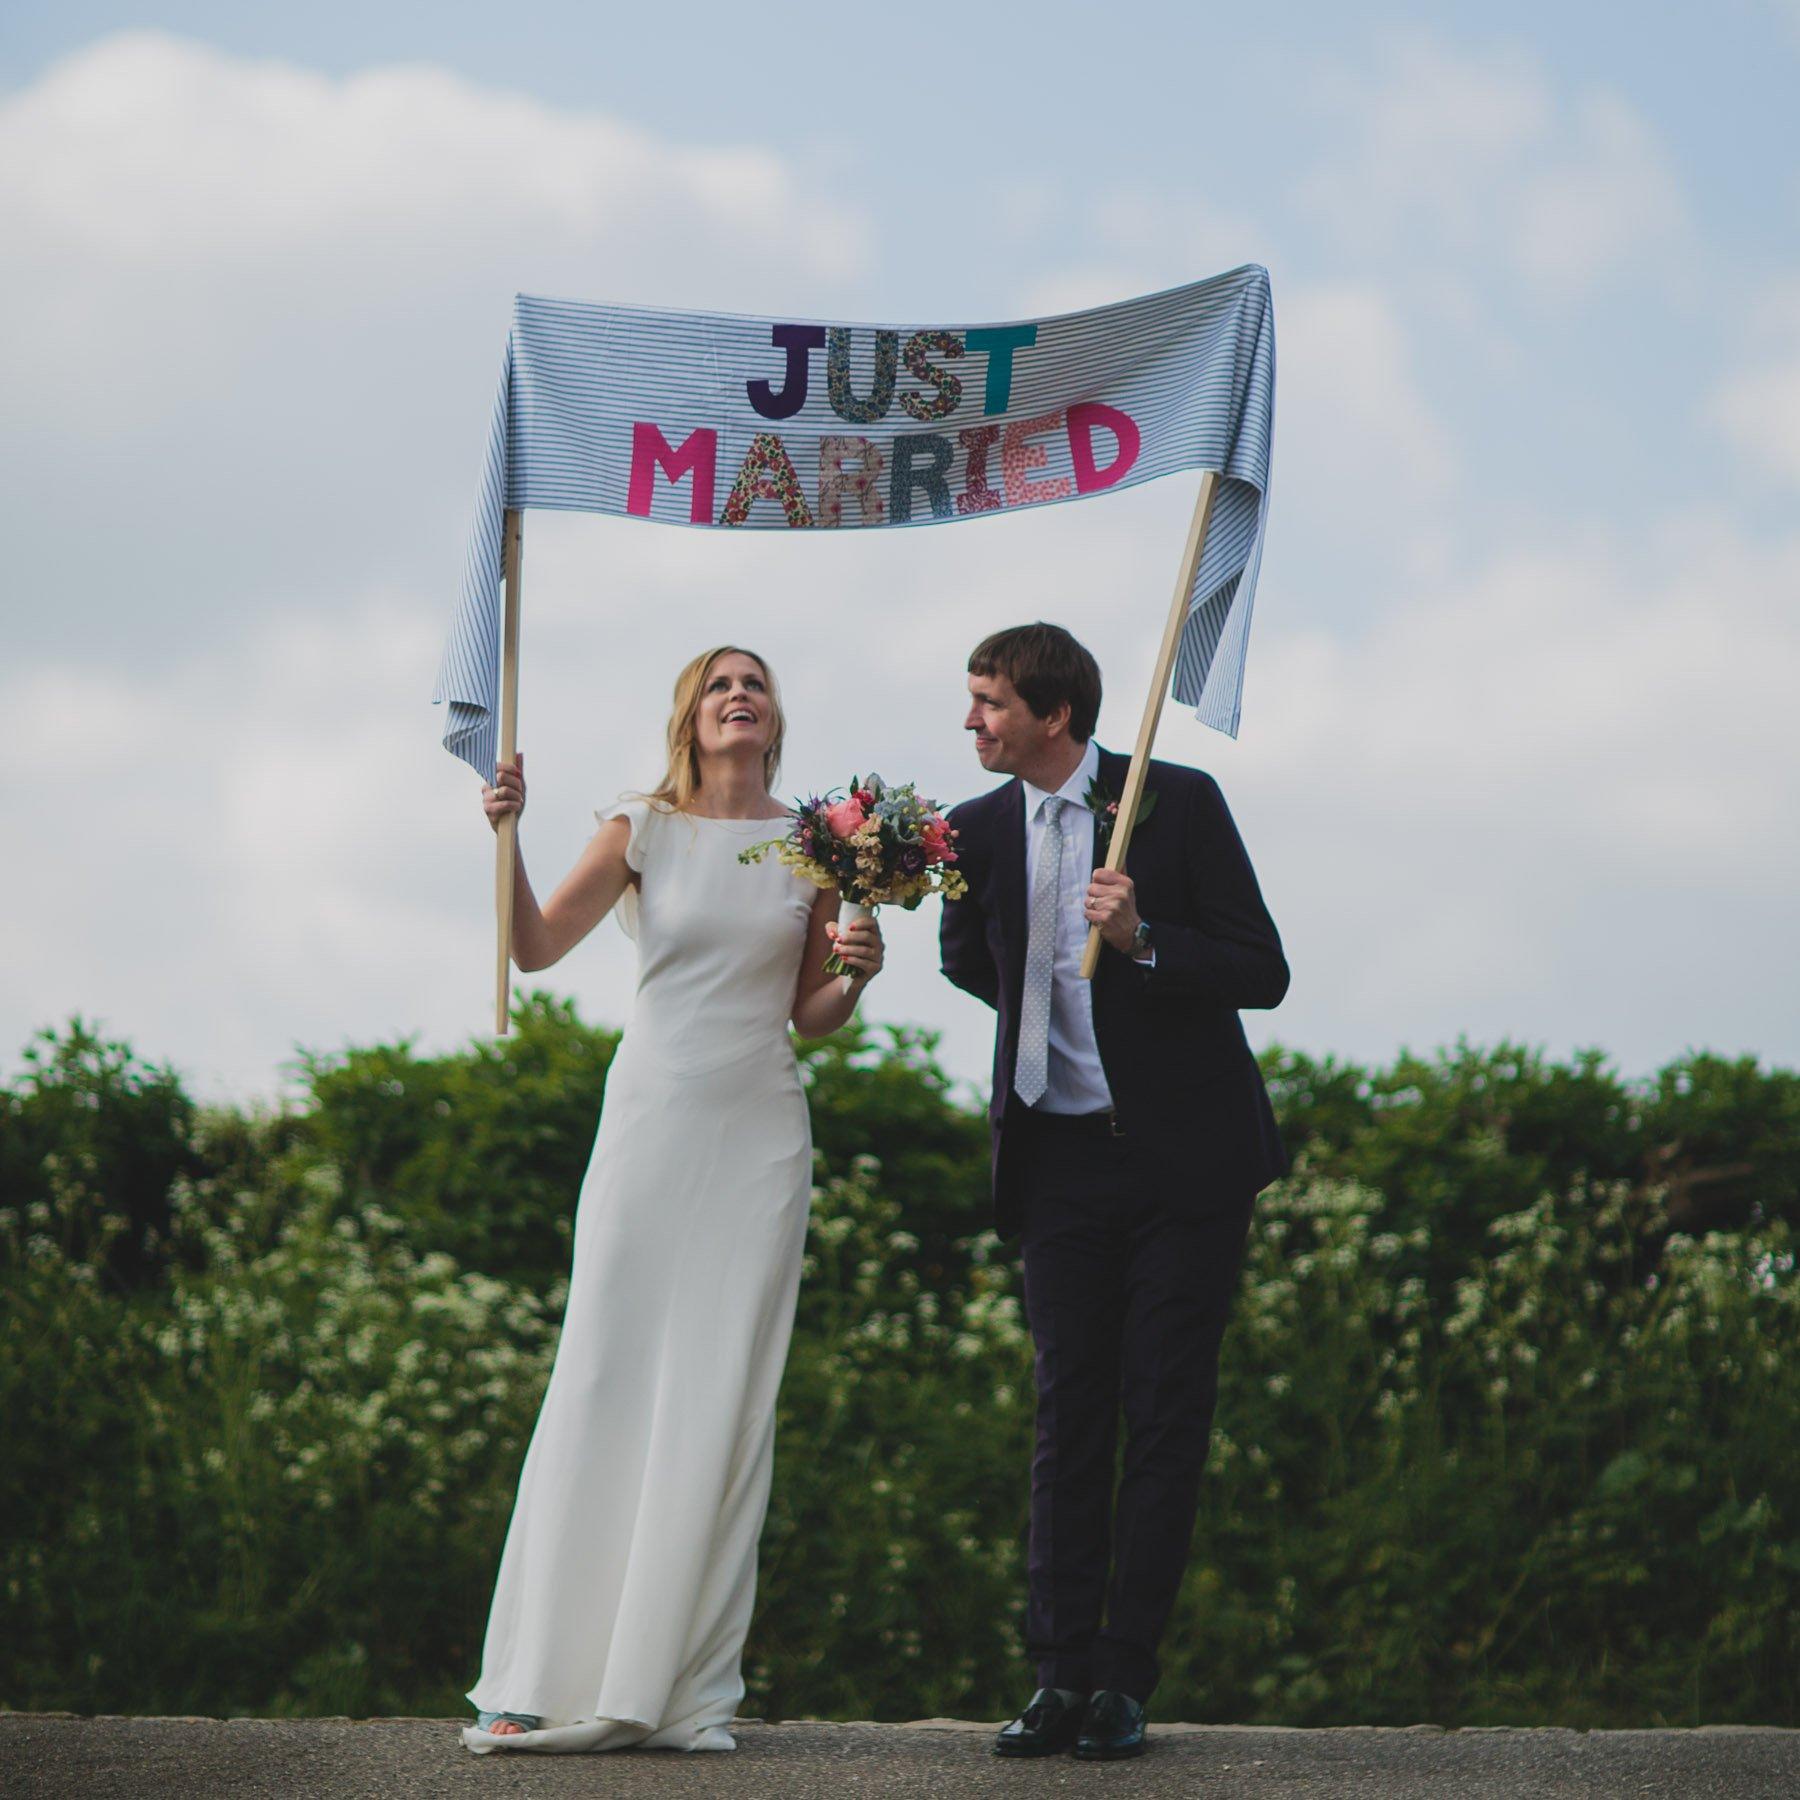 Buckinghamshire-Wedding-Lizzie-Duncan-105